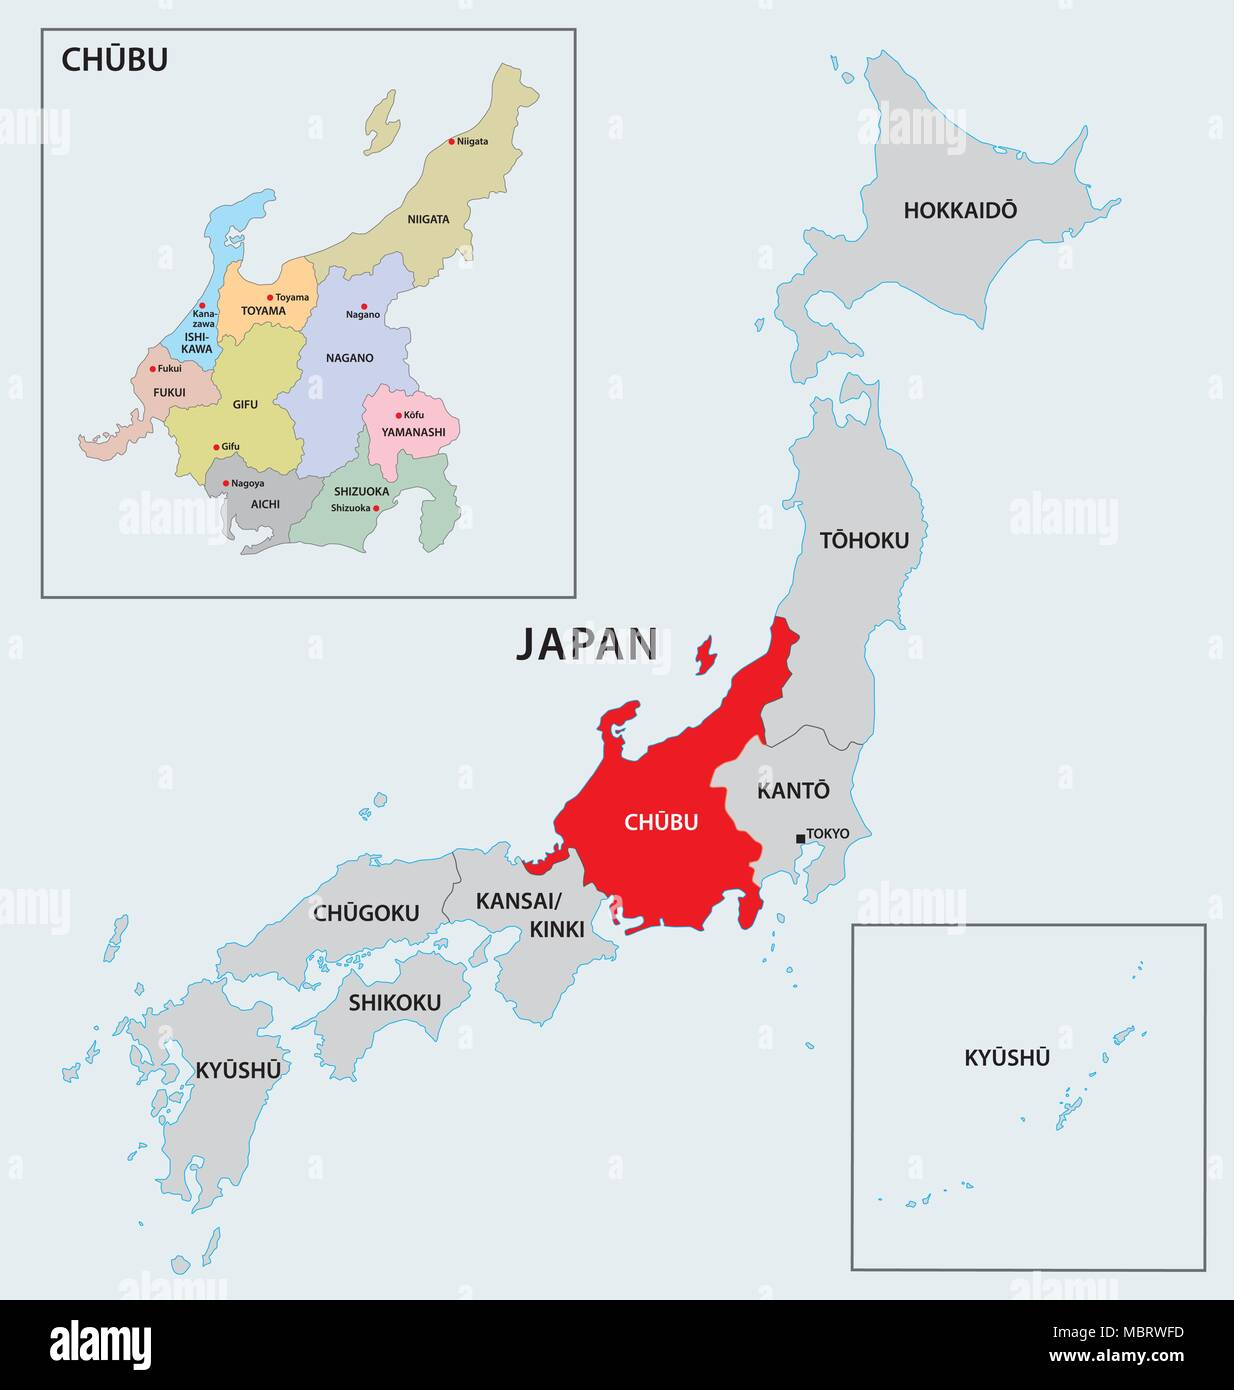 japan region chubu map - Stock Vector